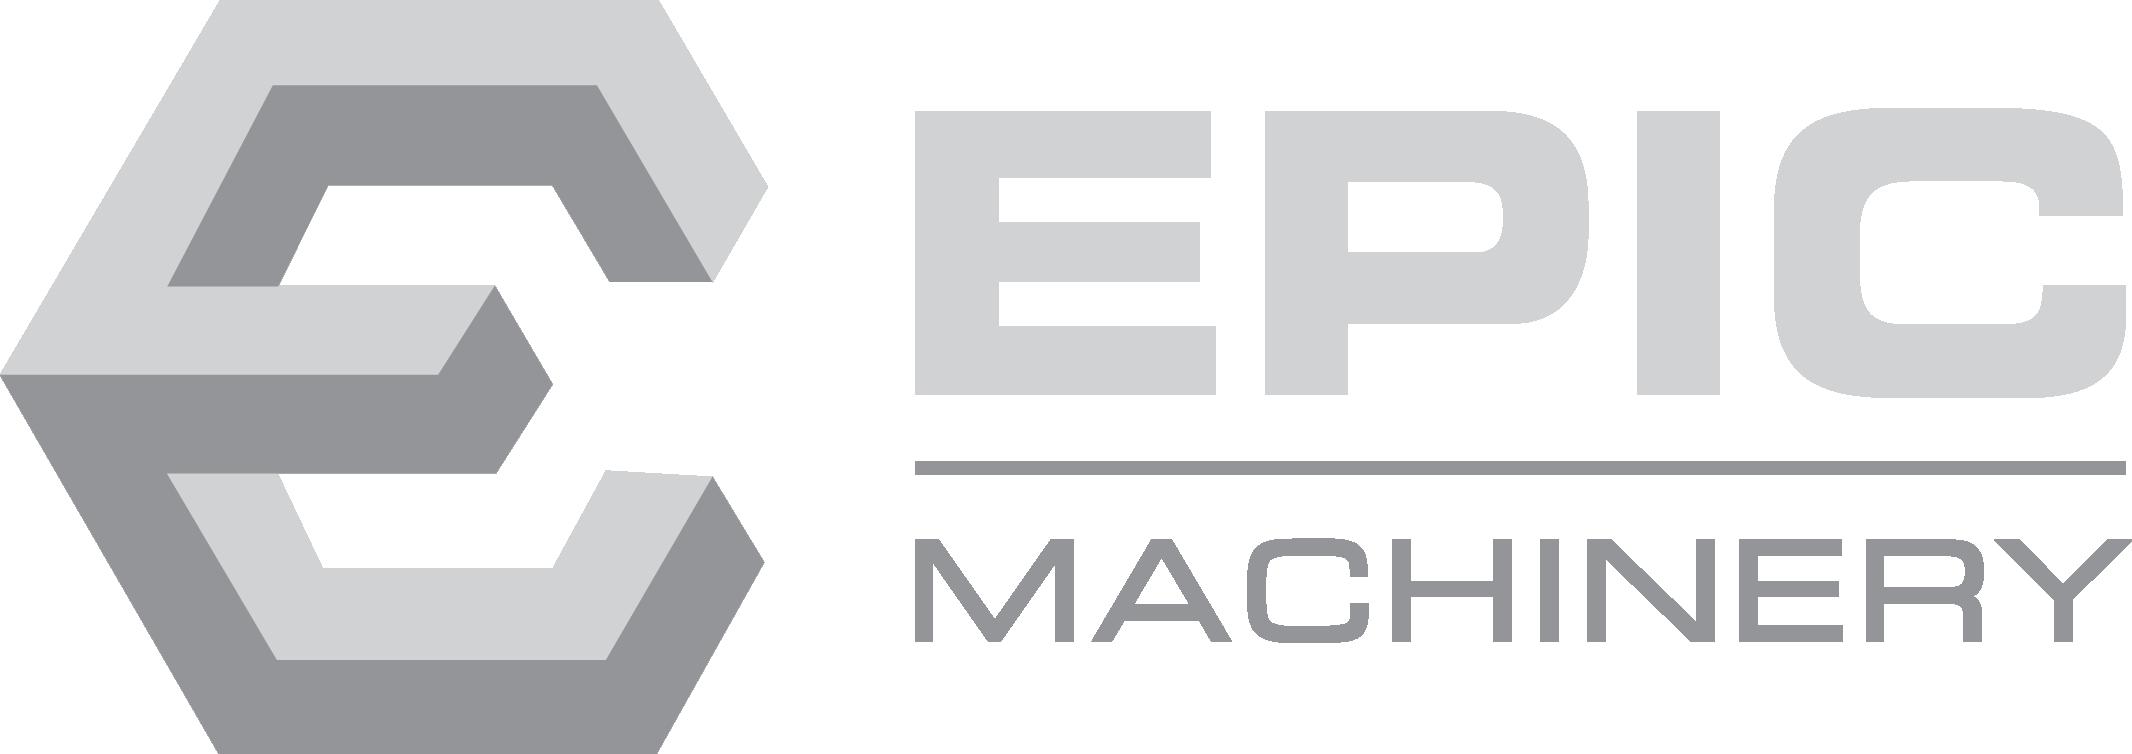 epic machinery logo